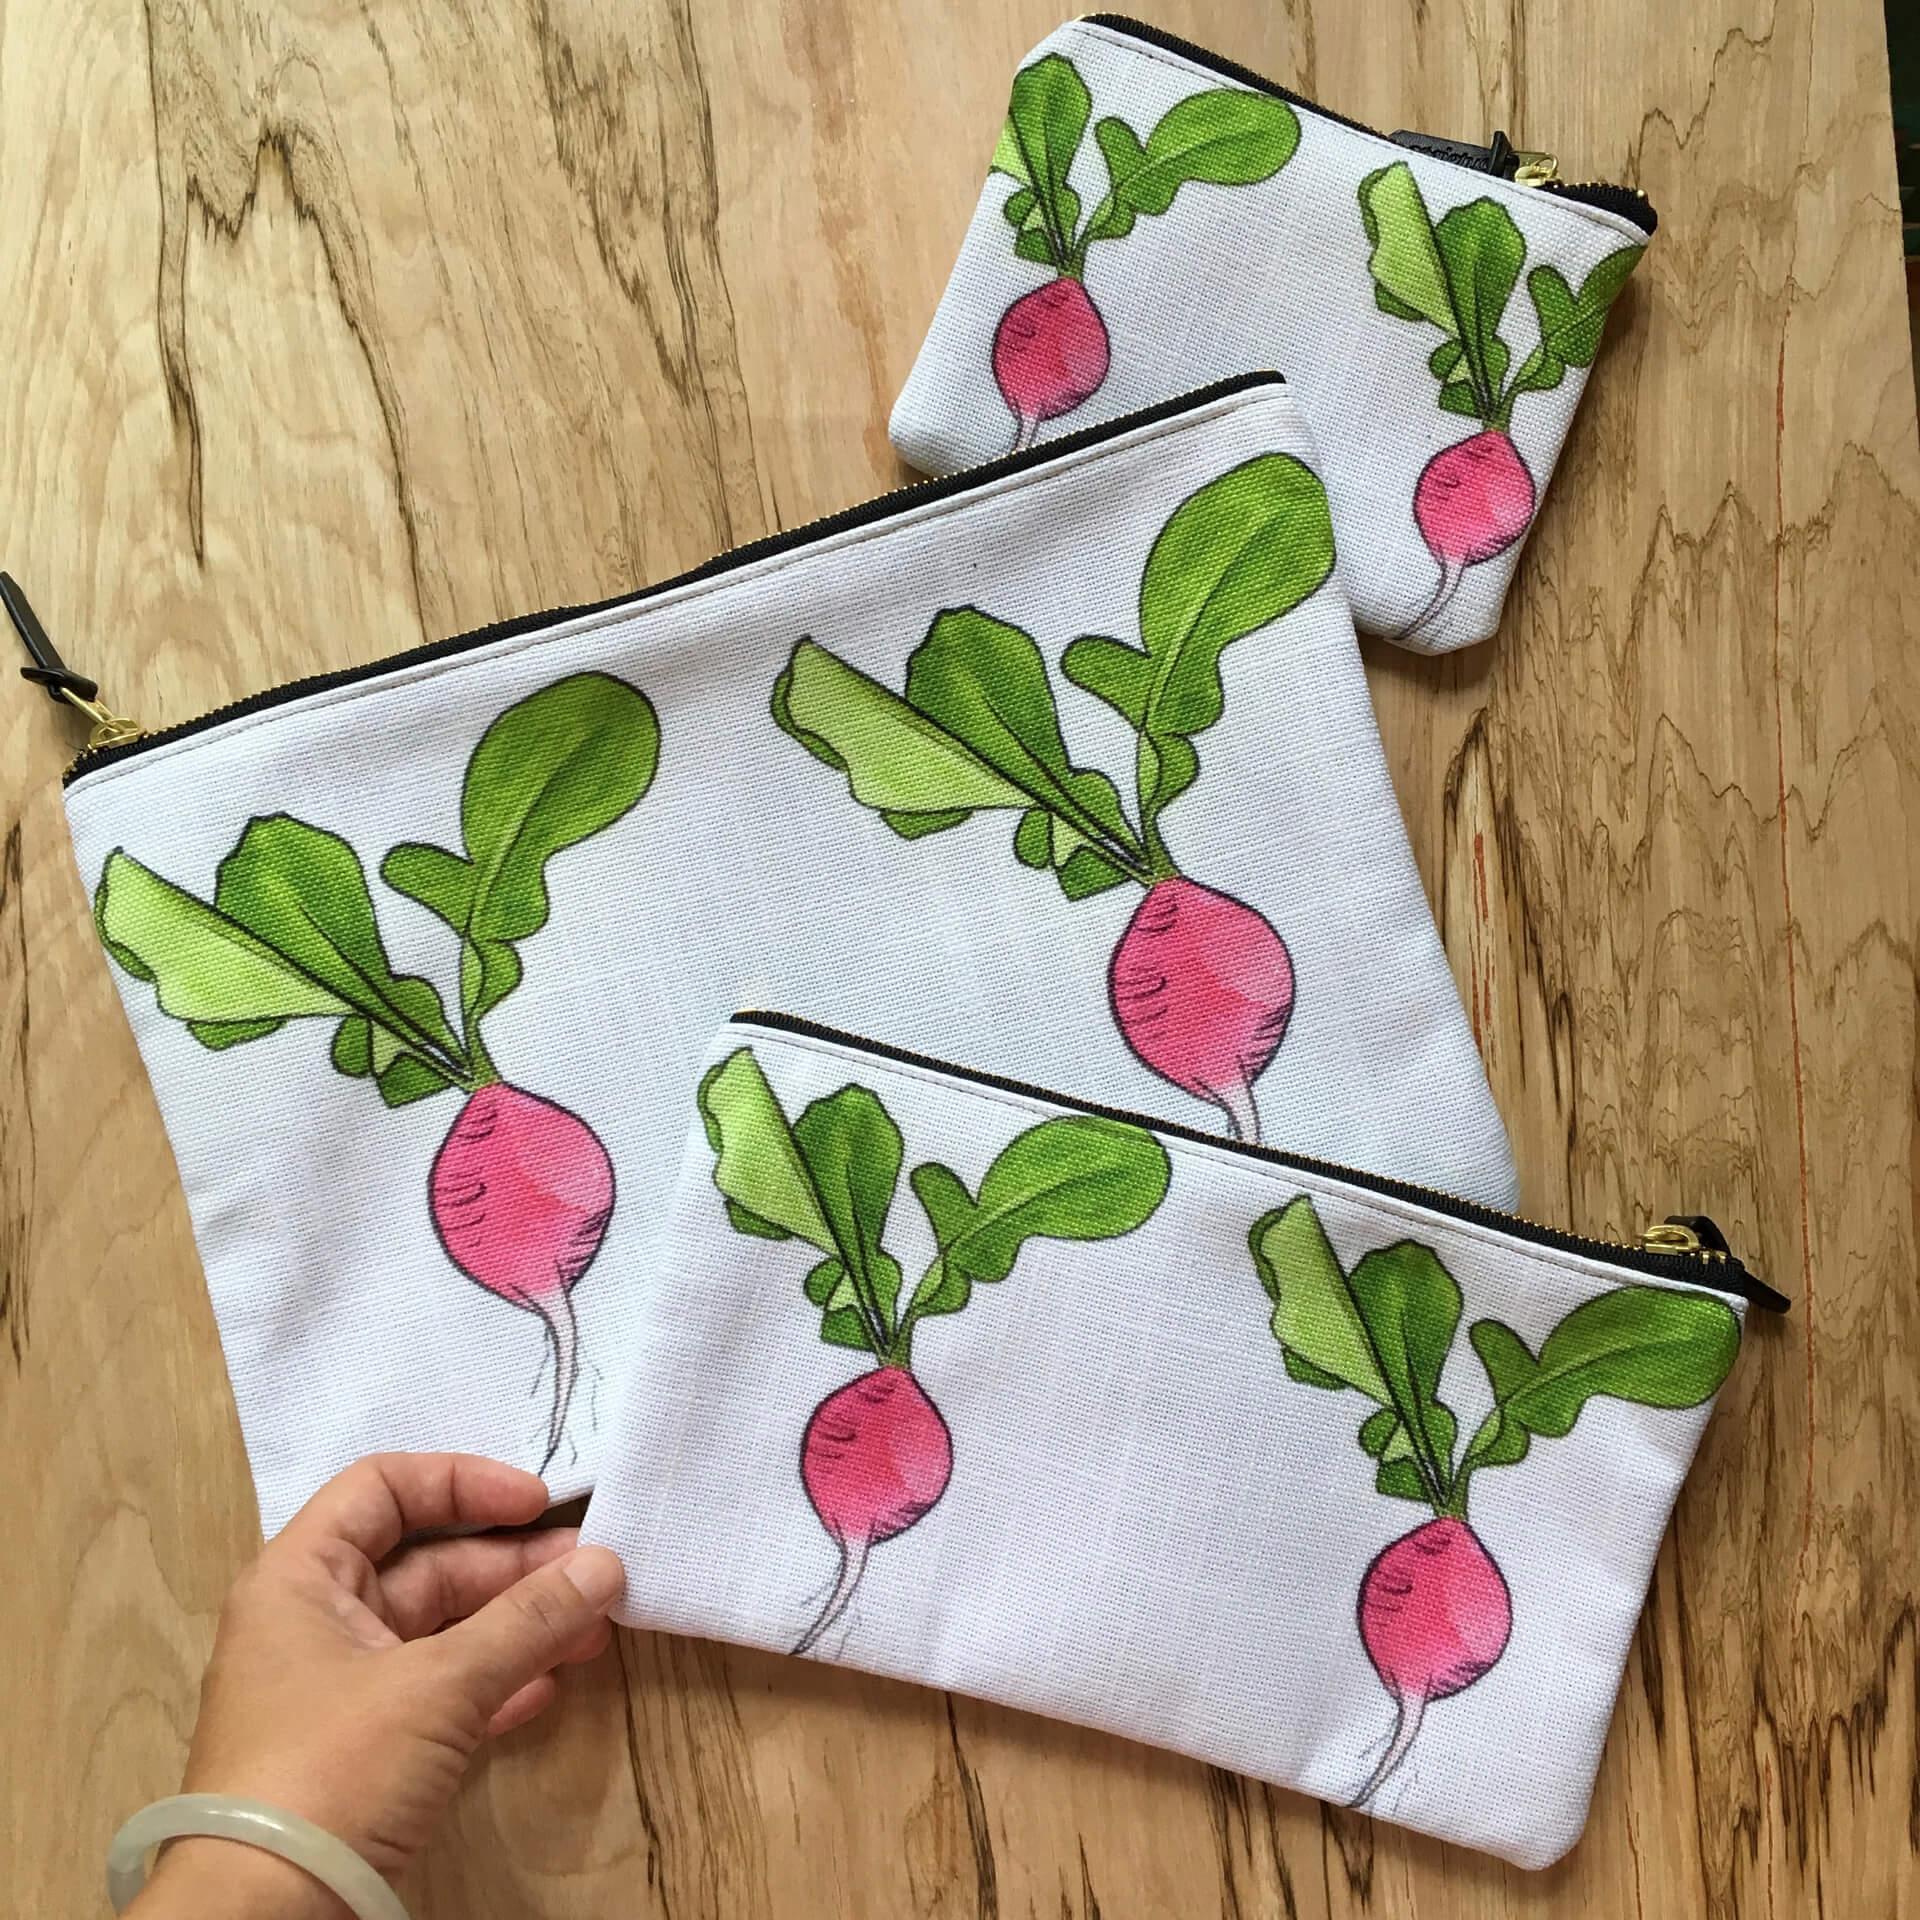 radish-pouches